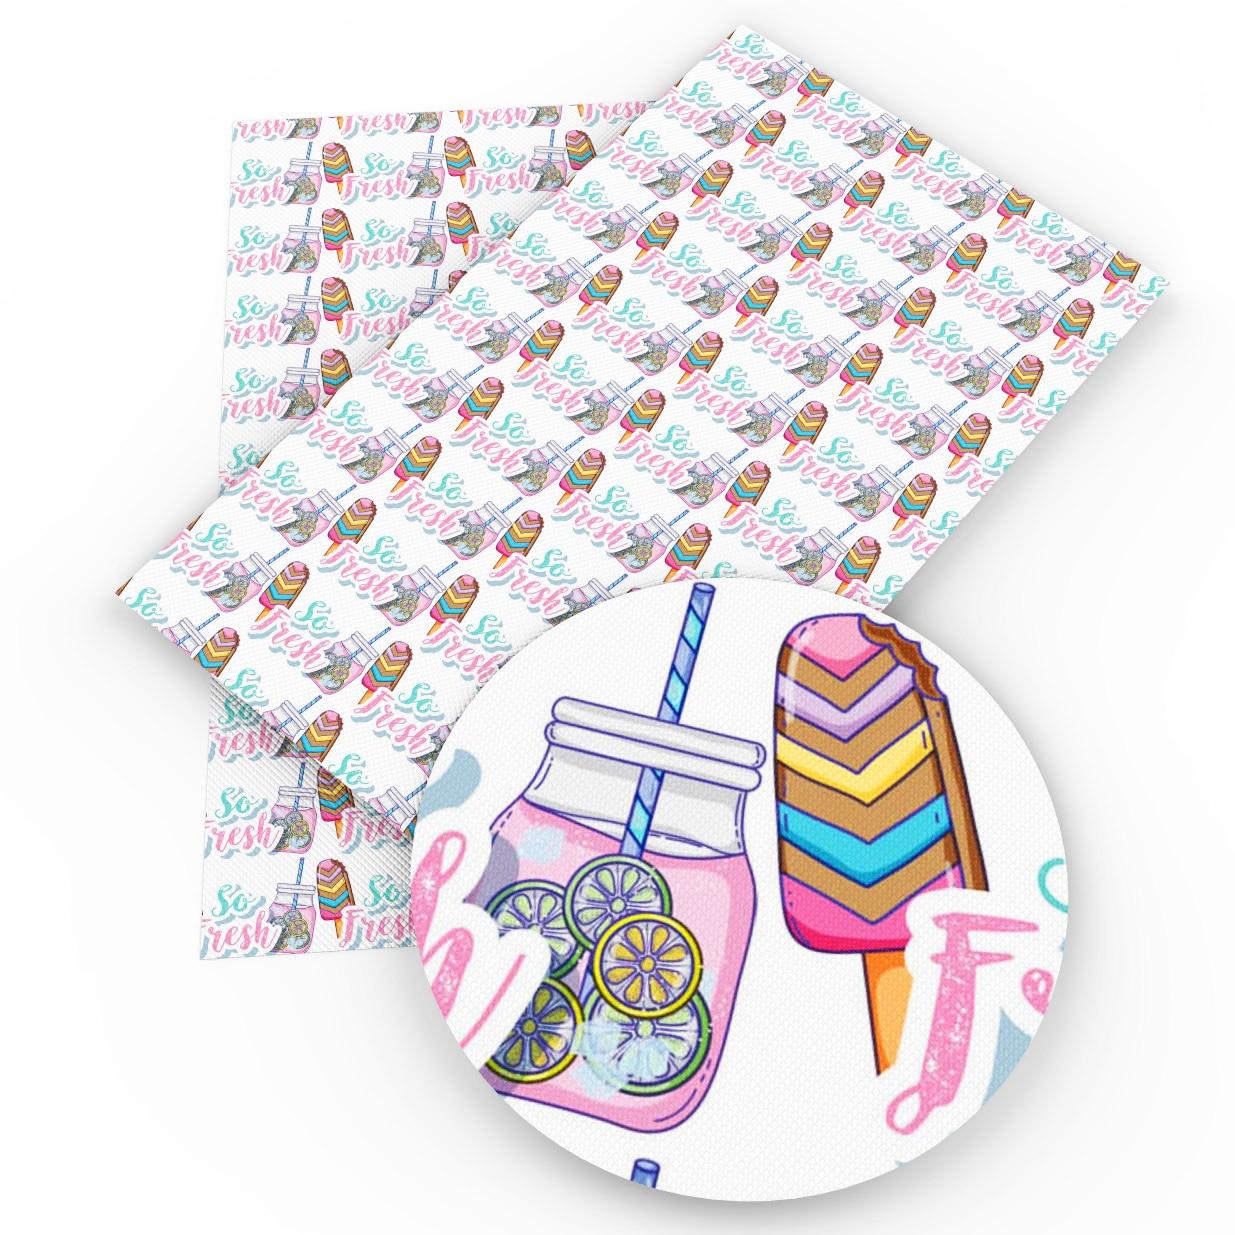 Accesorios David, 20x34cm, tarta de helado, piña, piel sintética falsa, tela DIY, prenda decorativa, bolsas de lazo, 1Yc3704